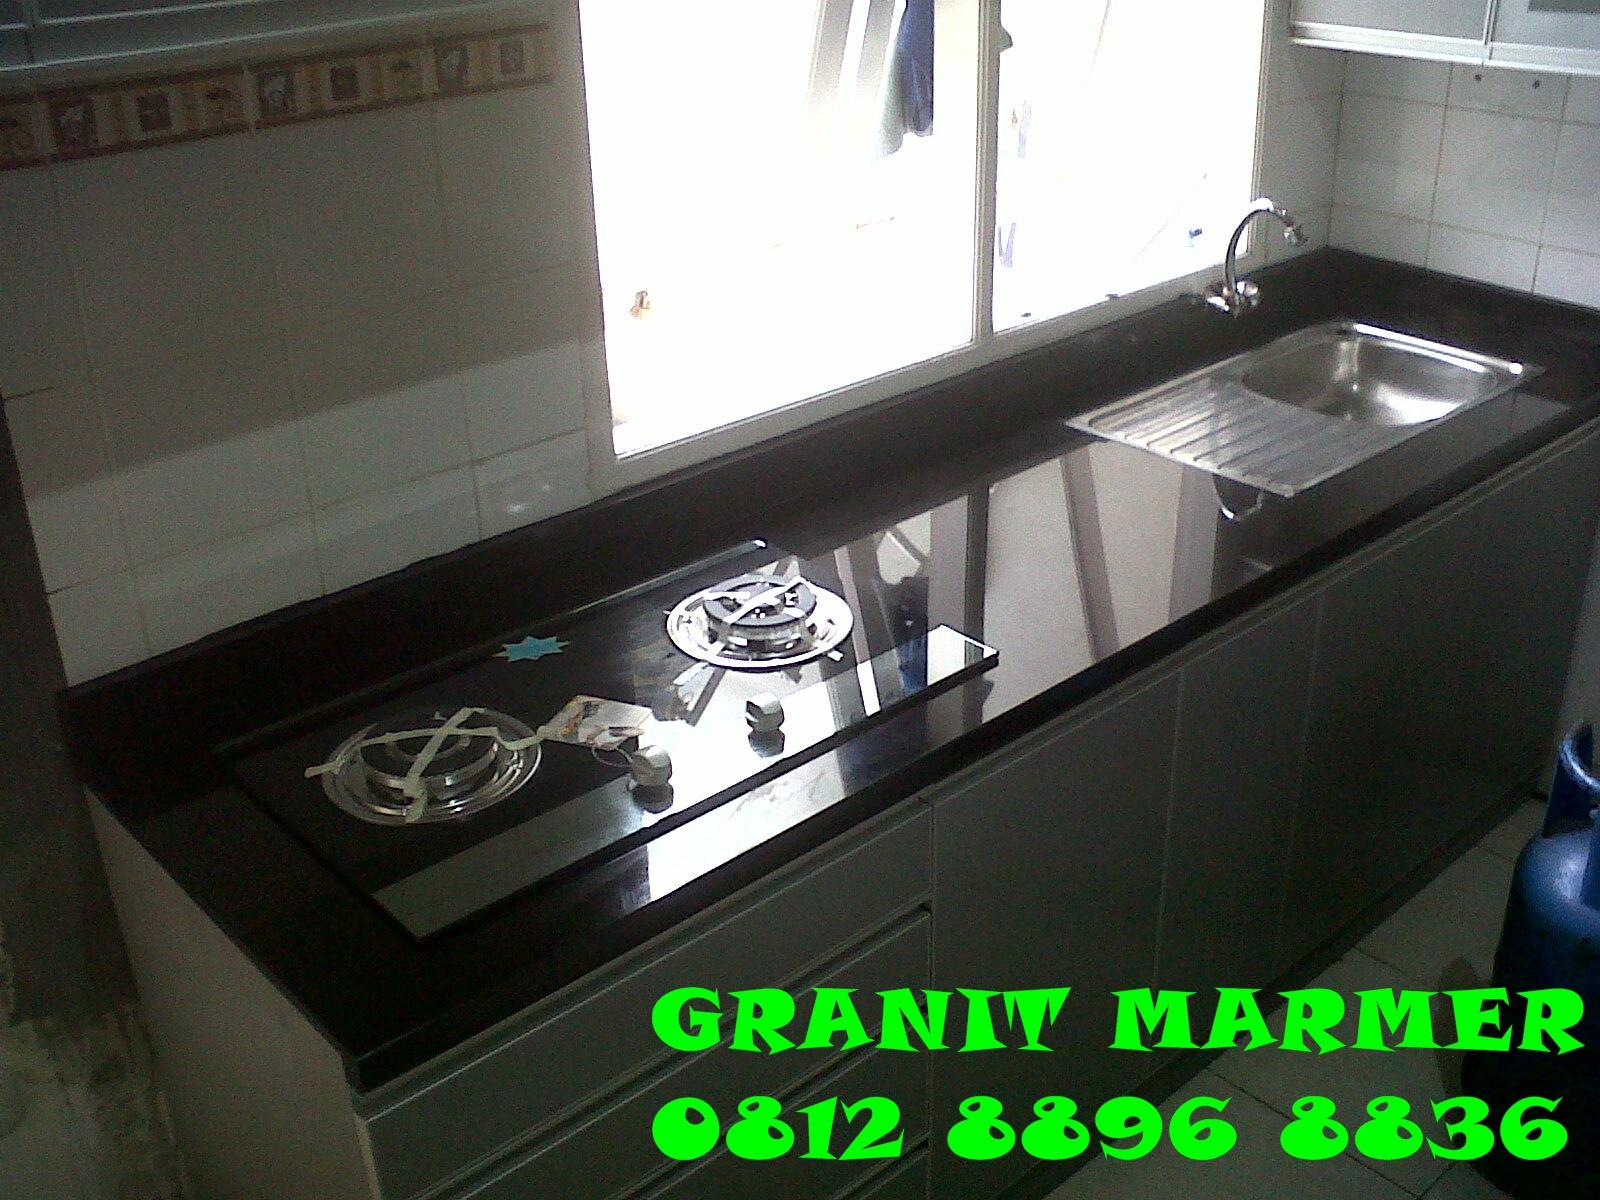 Jual Top Table Kitchen Set Granit Nero Absolute Granit Marmer